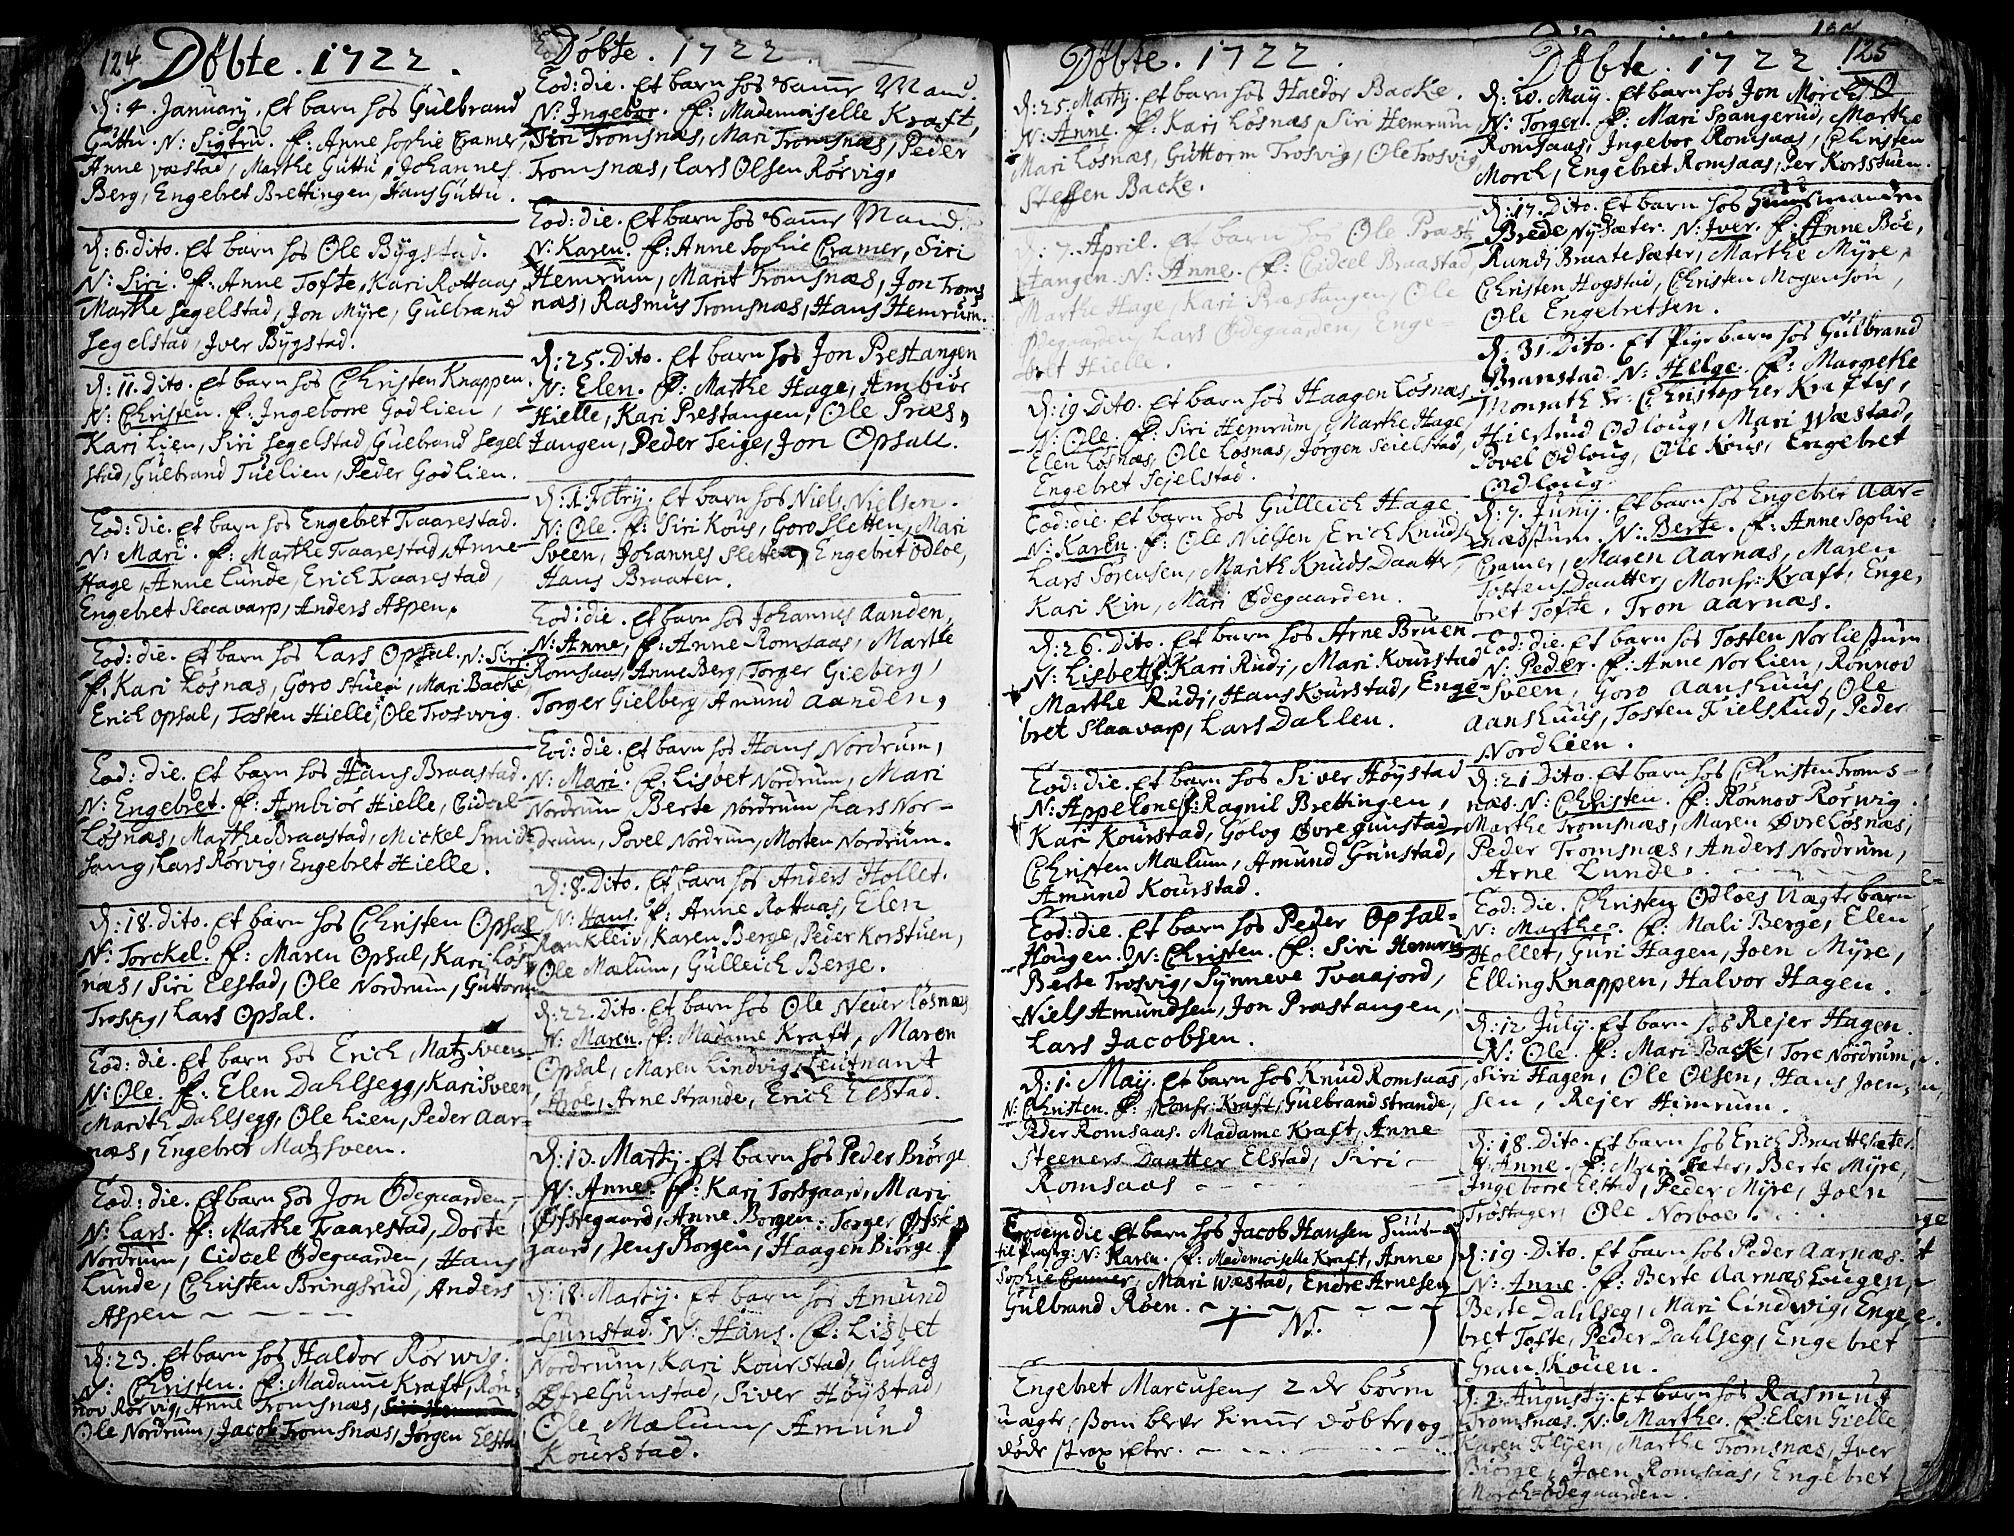 SAH, Ringebu prestekontor, Ministerialbok nr. 1, 1696-1733, s. 124-125